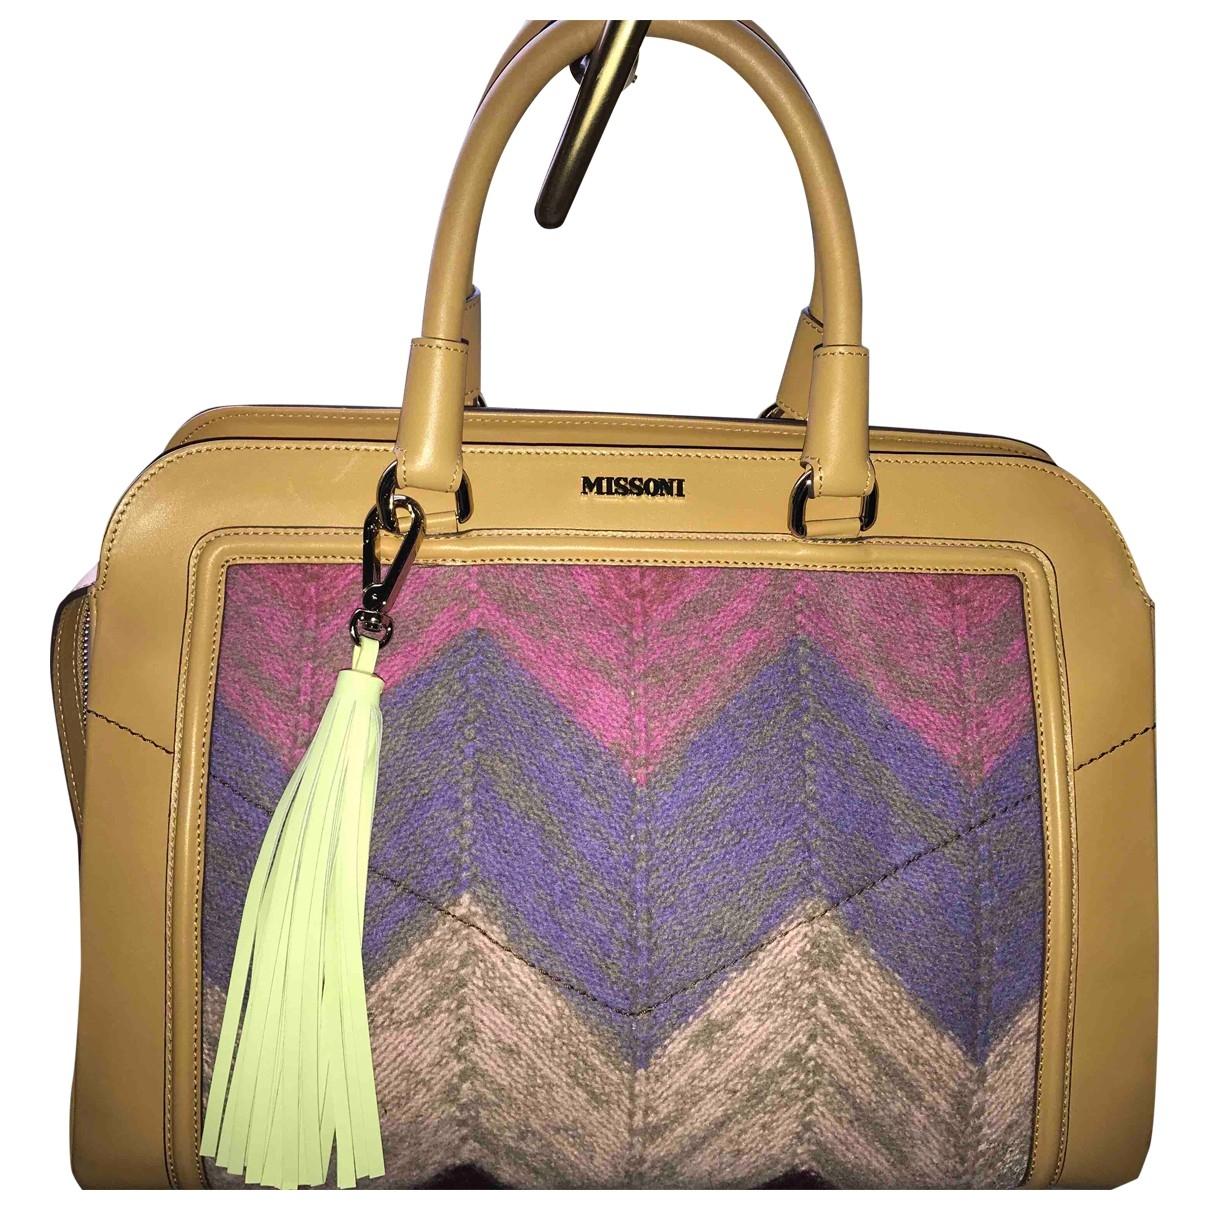 Missoni \N Handtasche in  Beige Leder